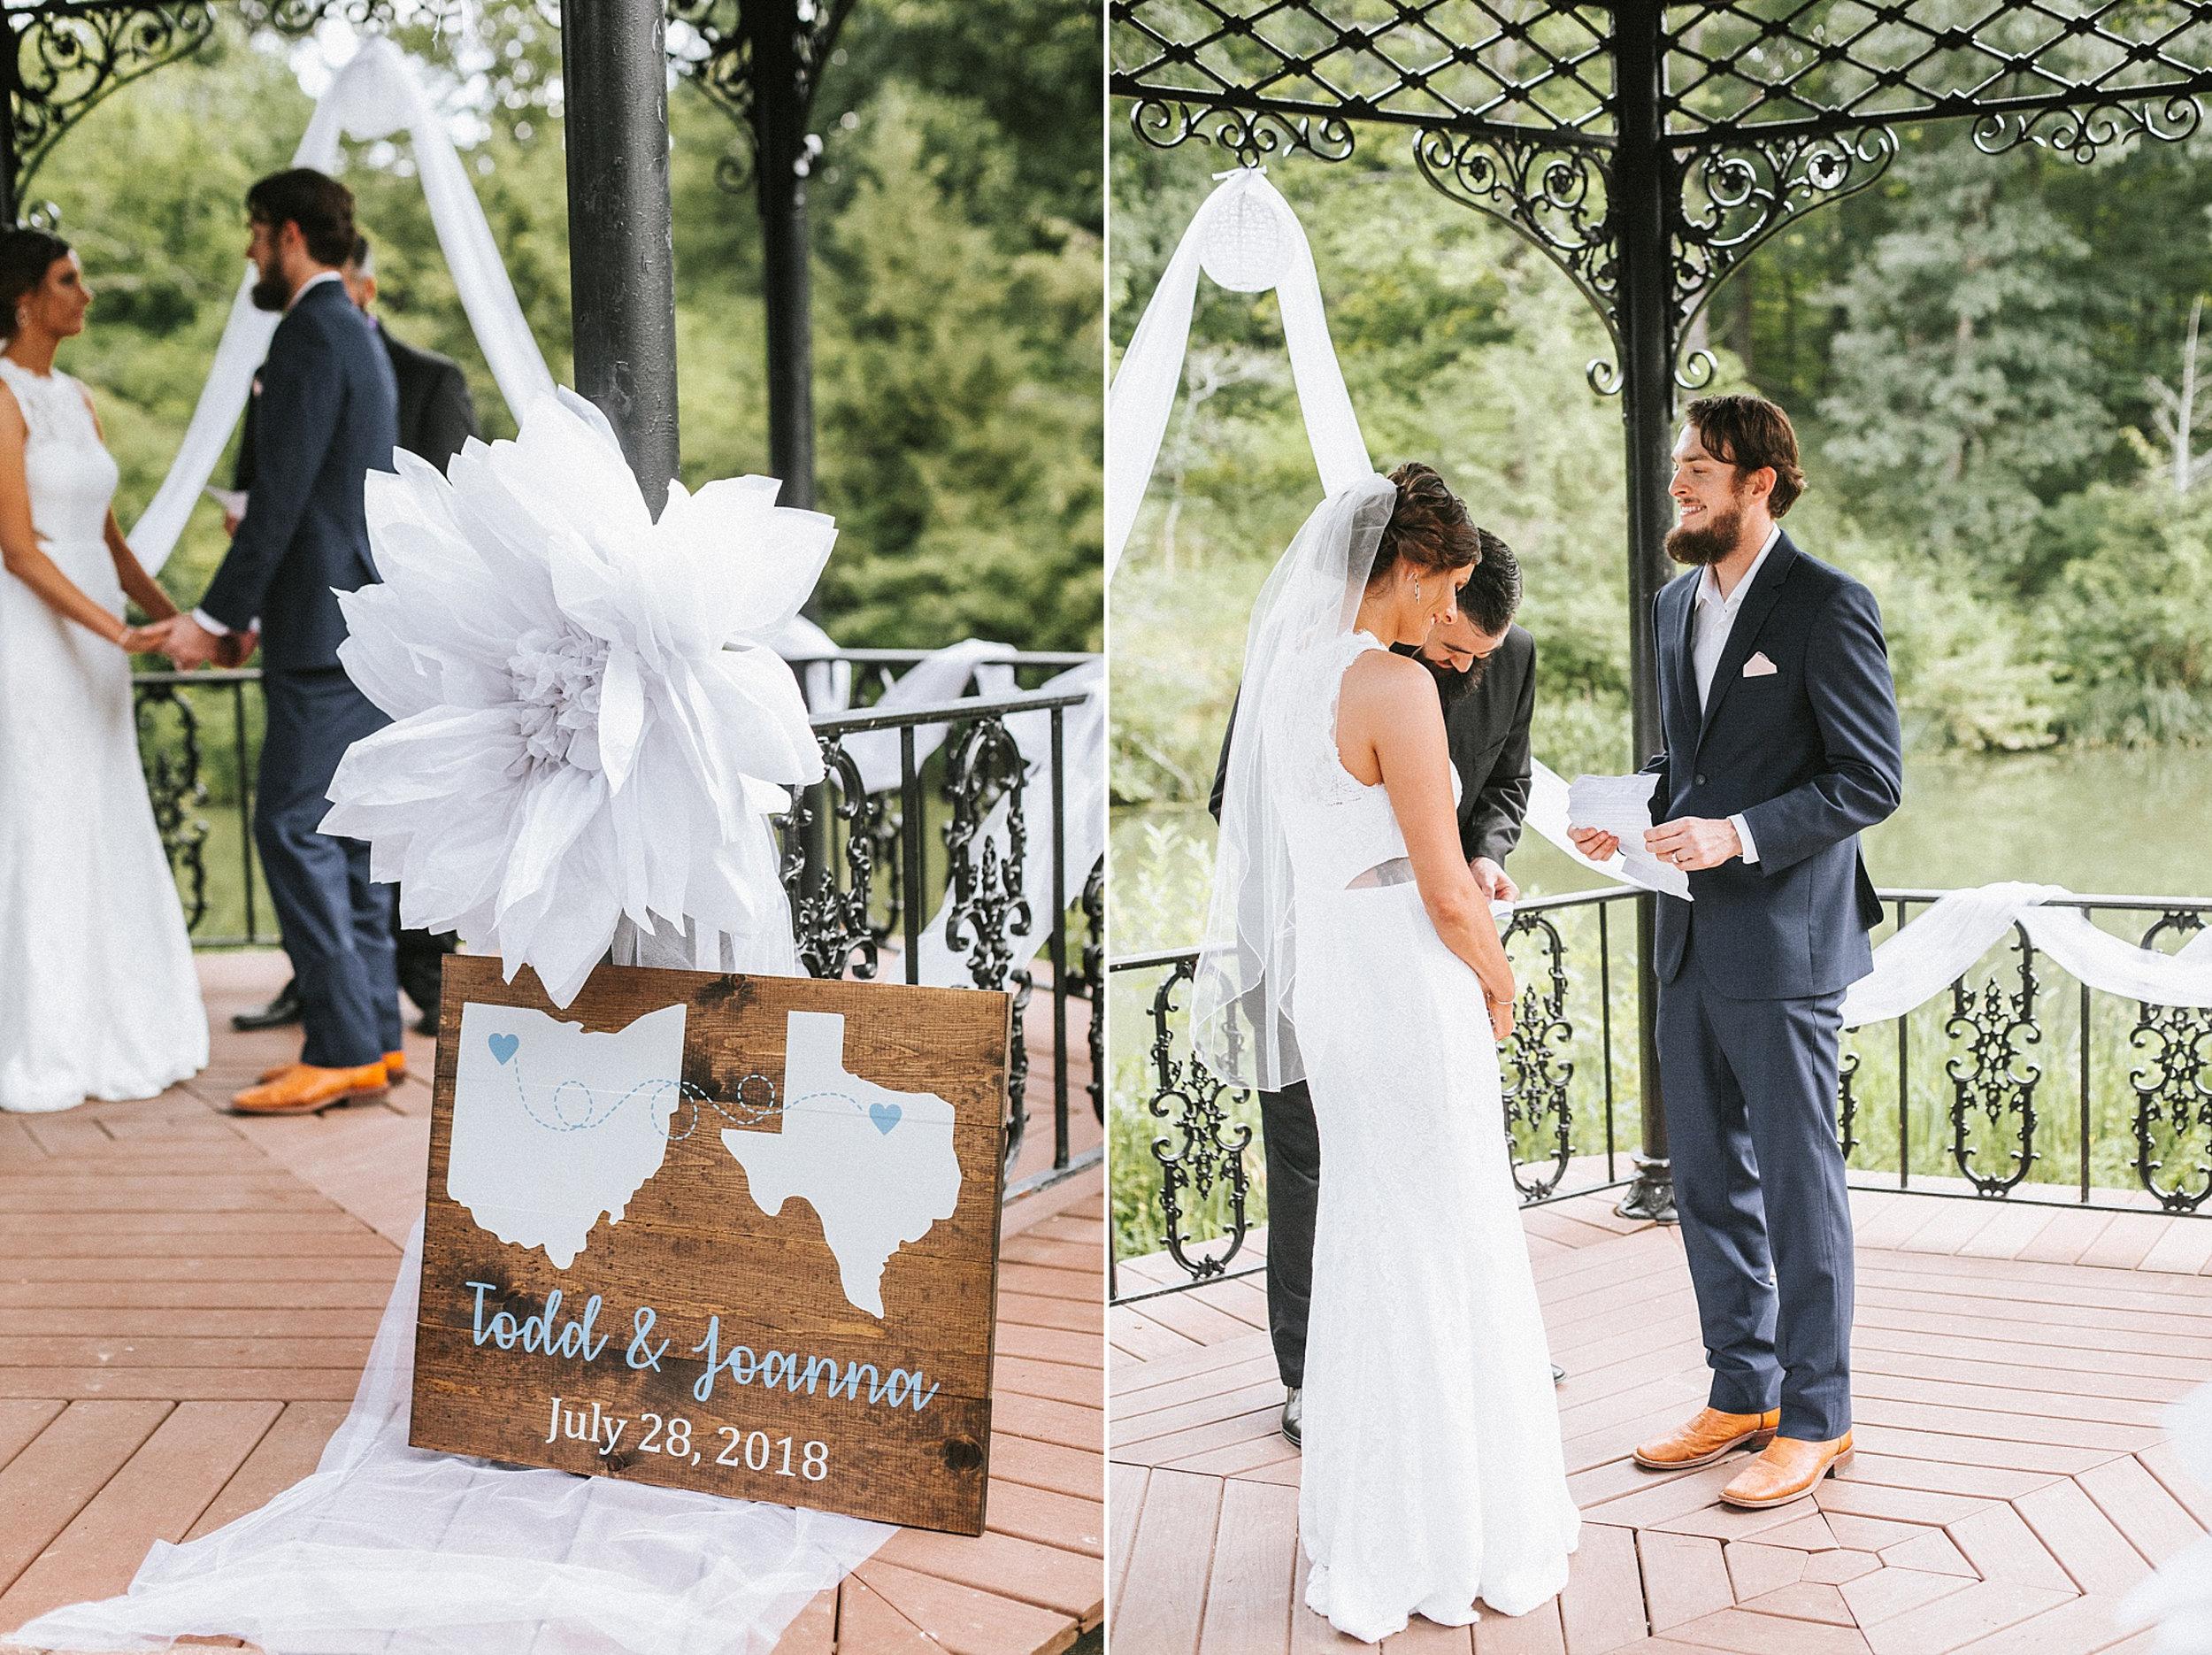 Brooke Townsend Photography - Ohio Wedding Photographer (64 of 78).jpg